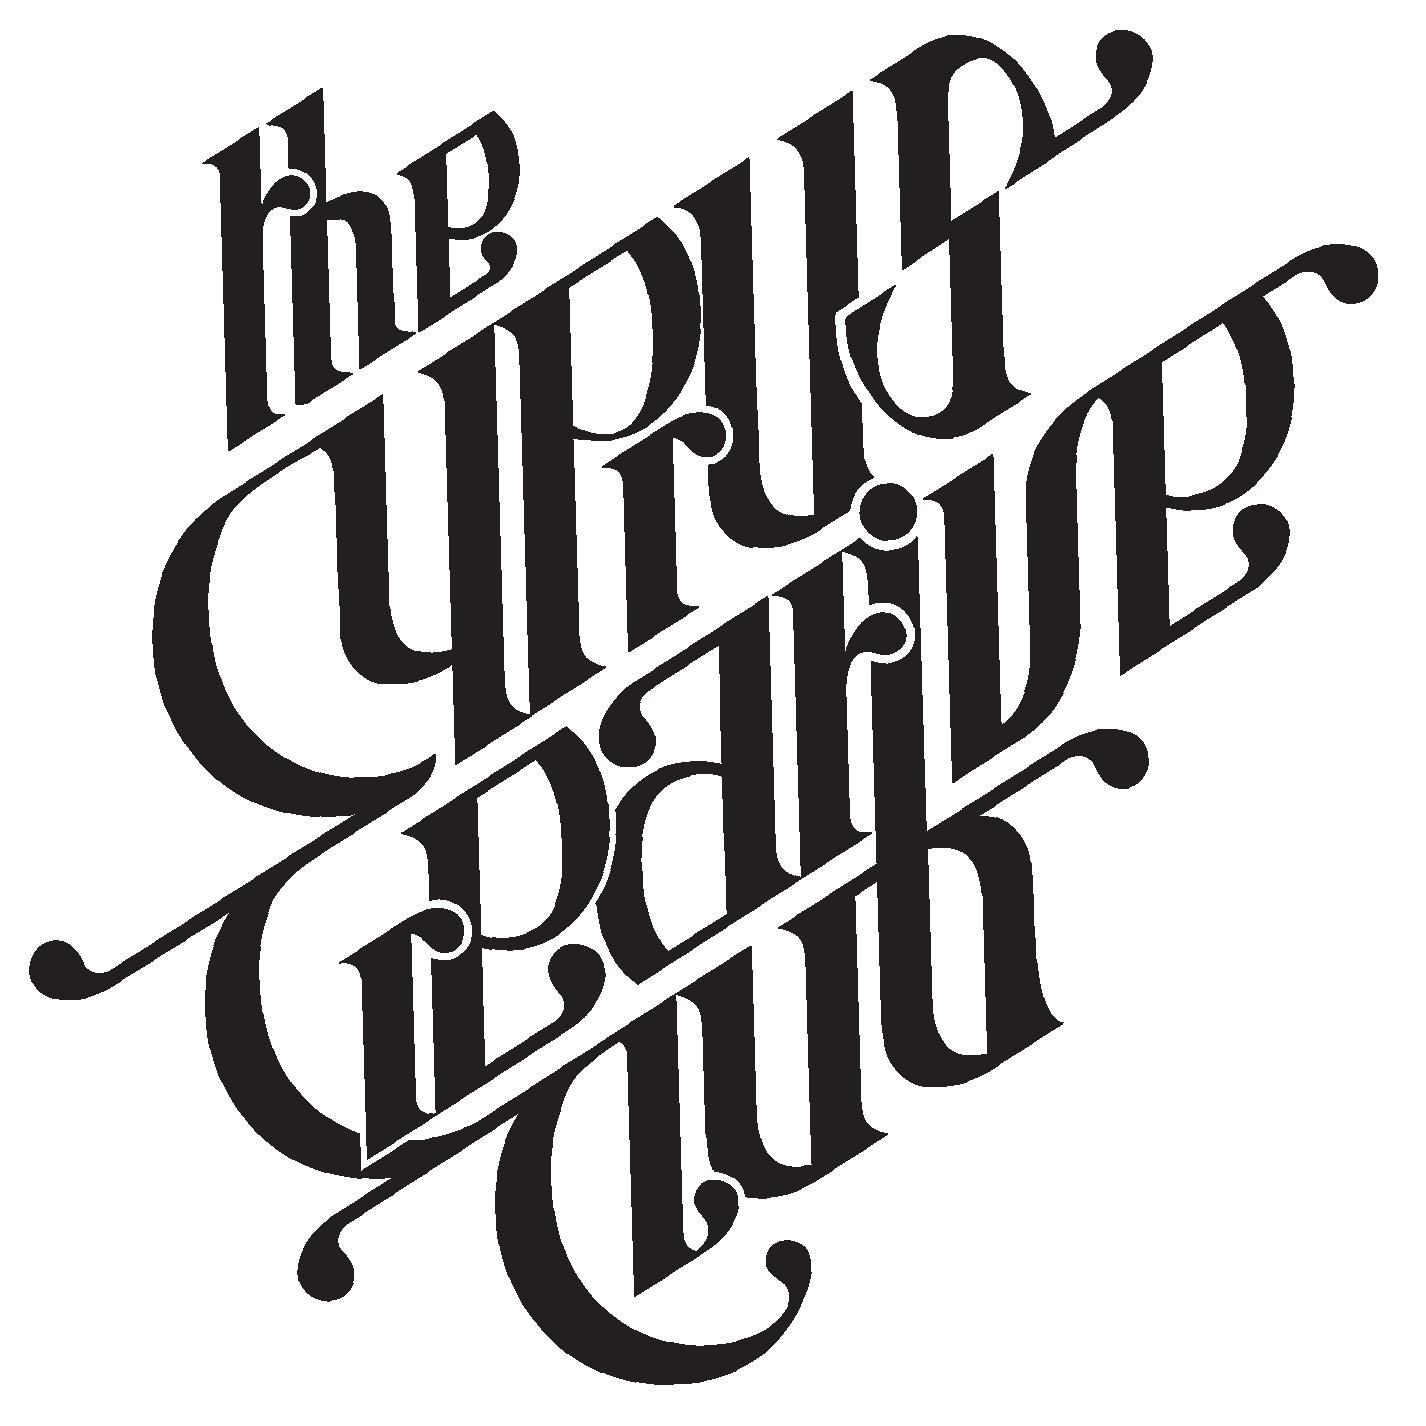 The Cyprus Creative Club